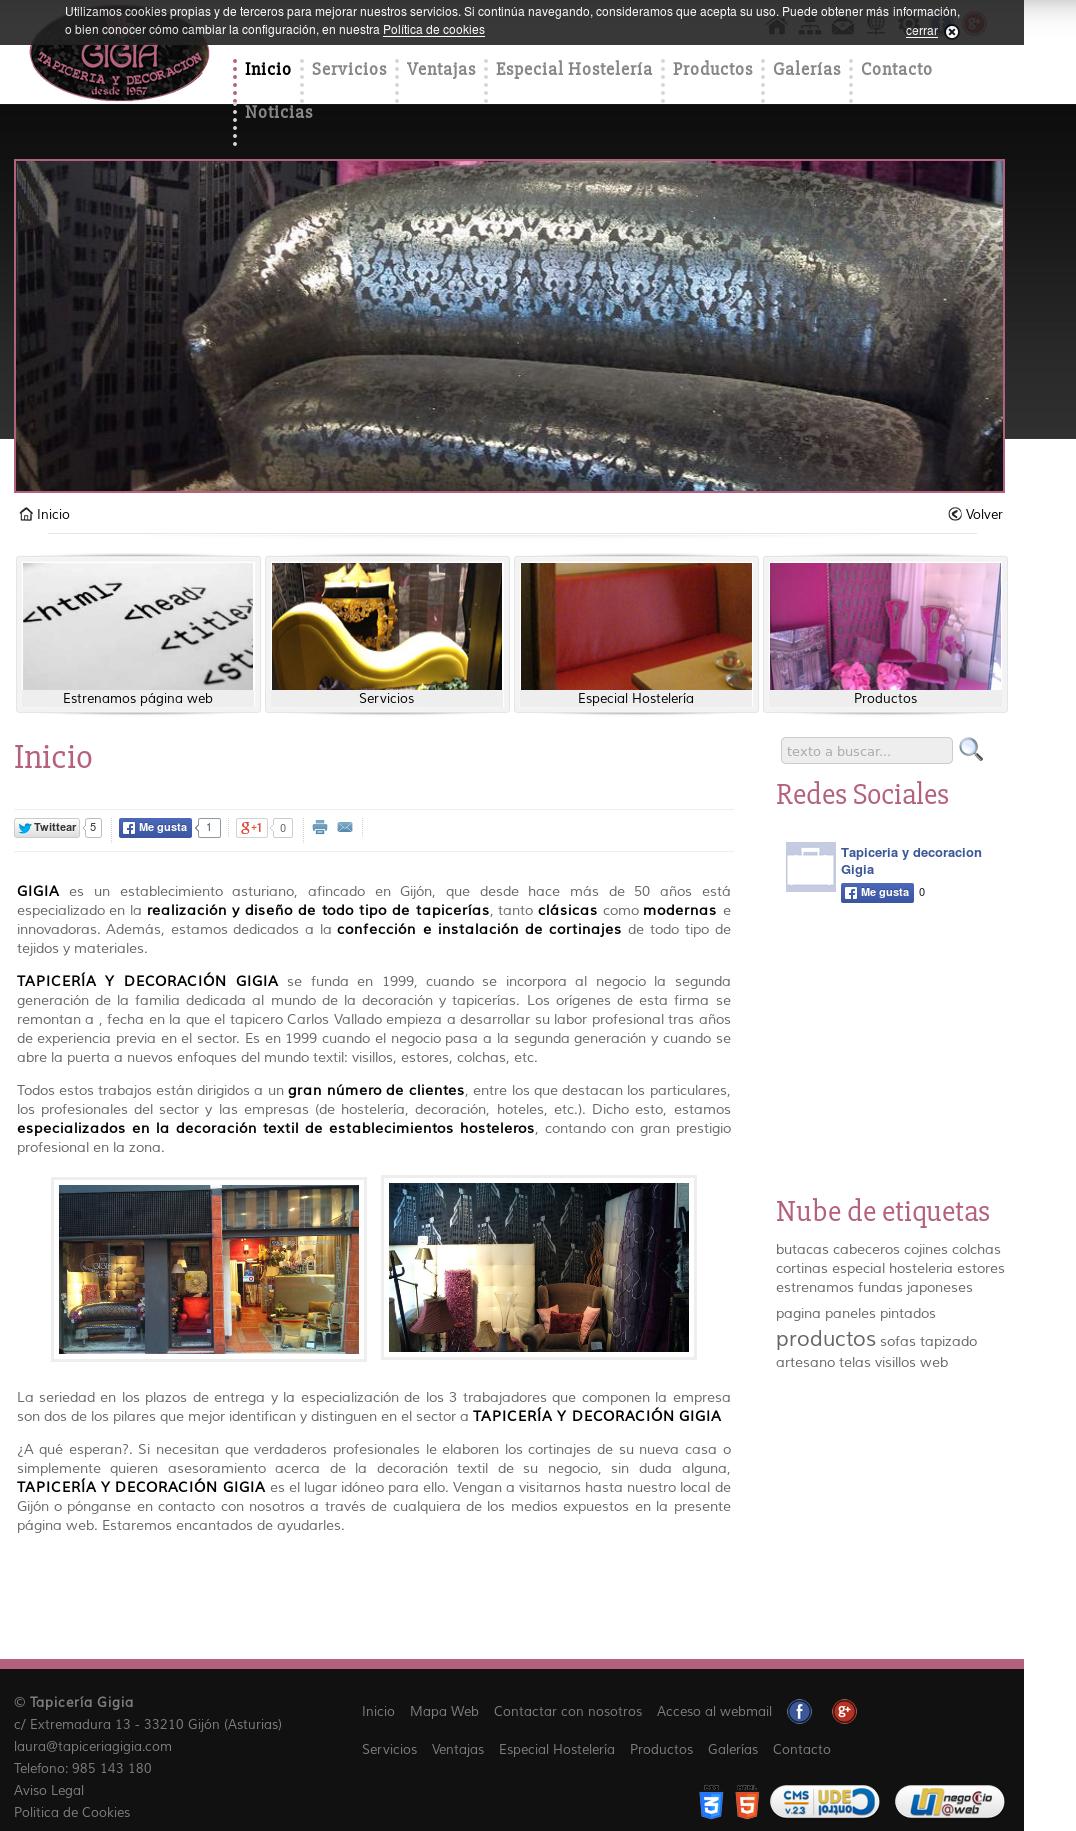 Tapiceria y decoracion gigia company profile owler - Tapiceria y decoracion ...